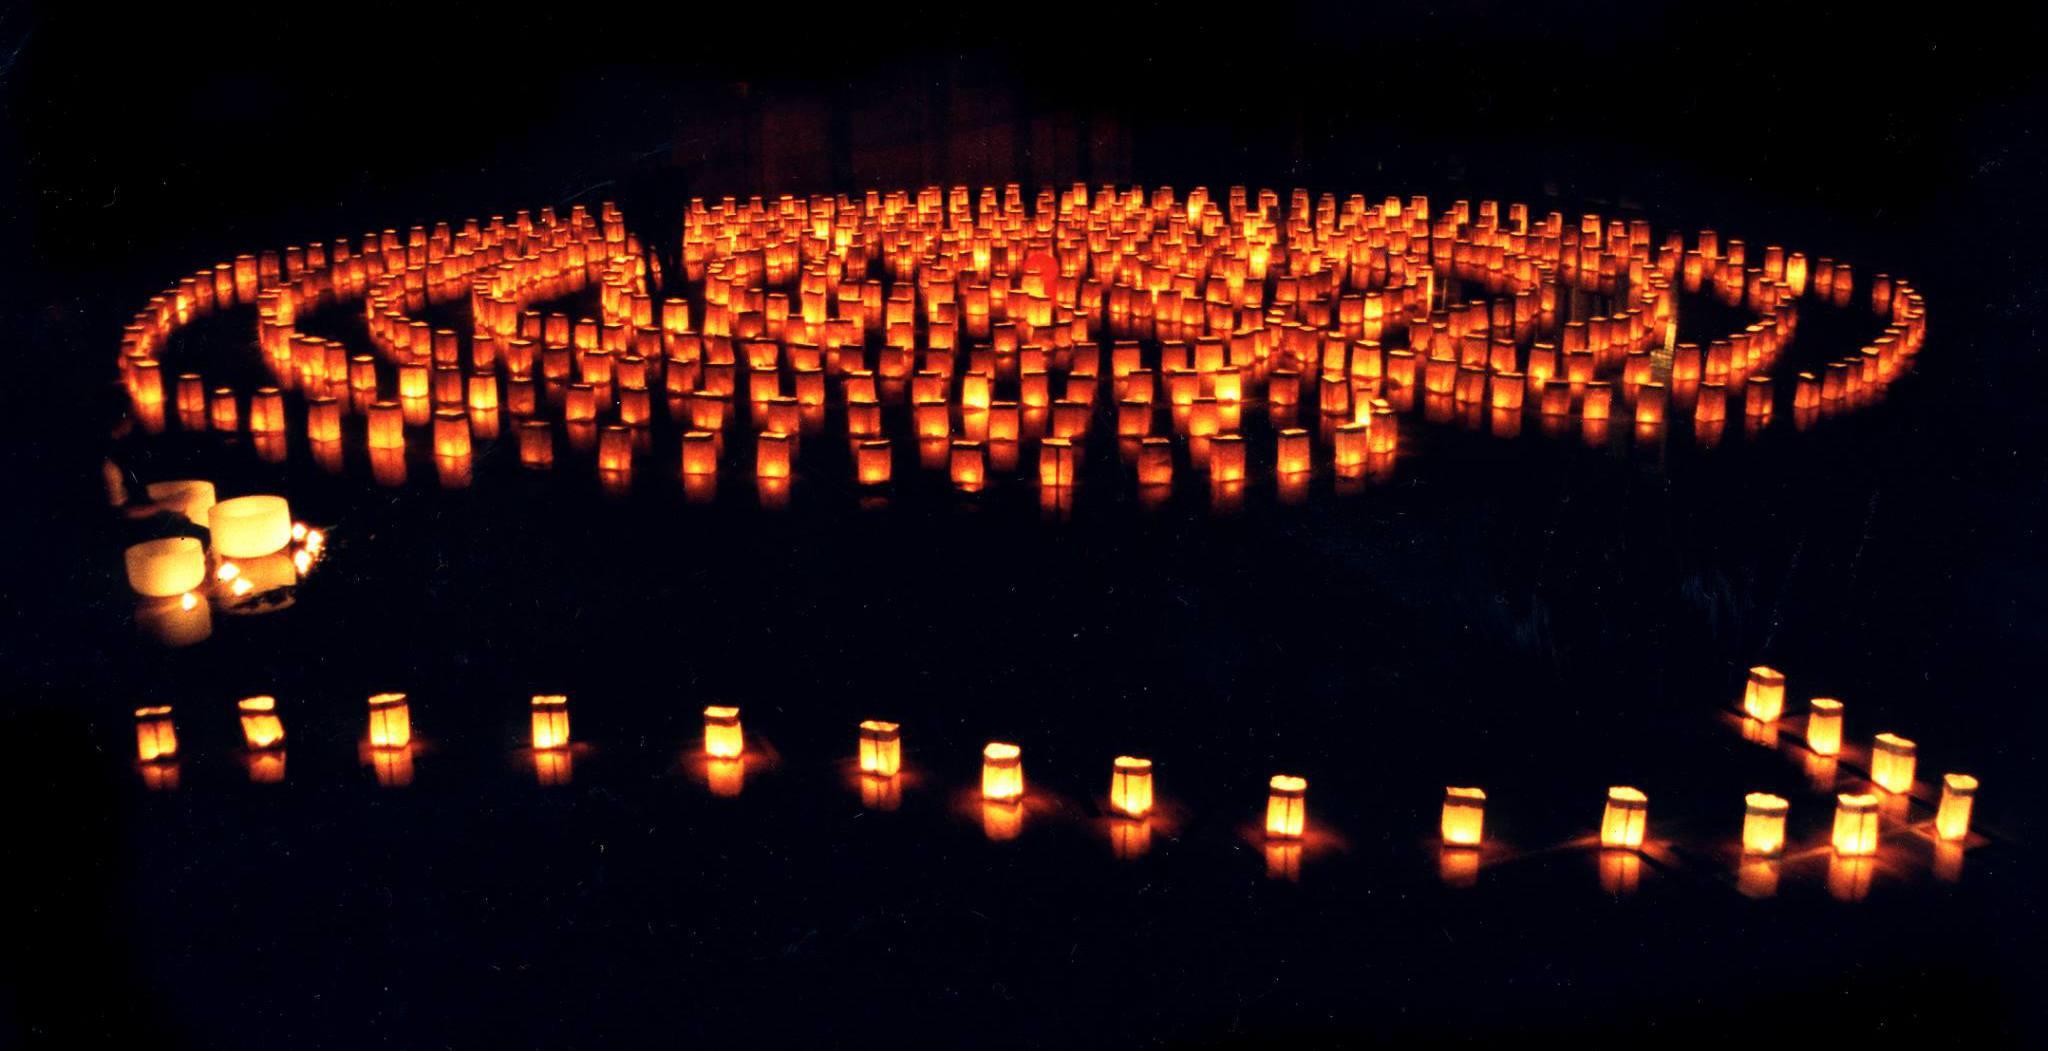 Labyrinth of light at the winter solstice lantern festival secret lantern society facebook